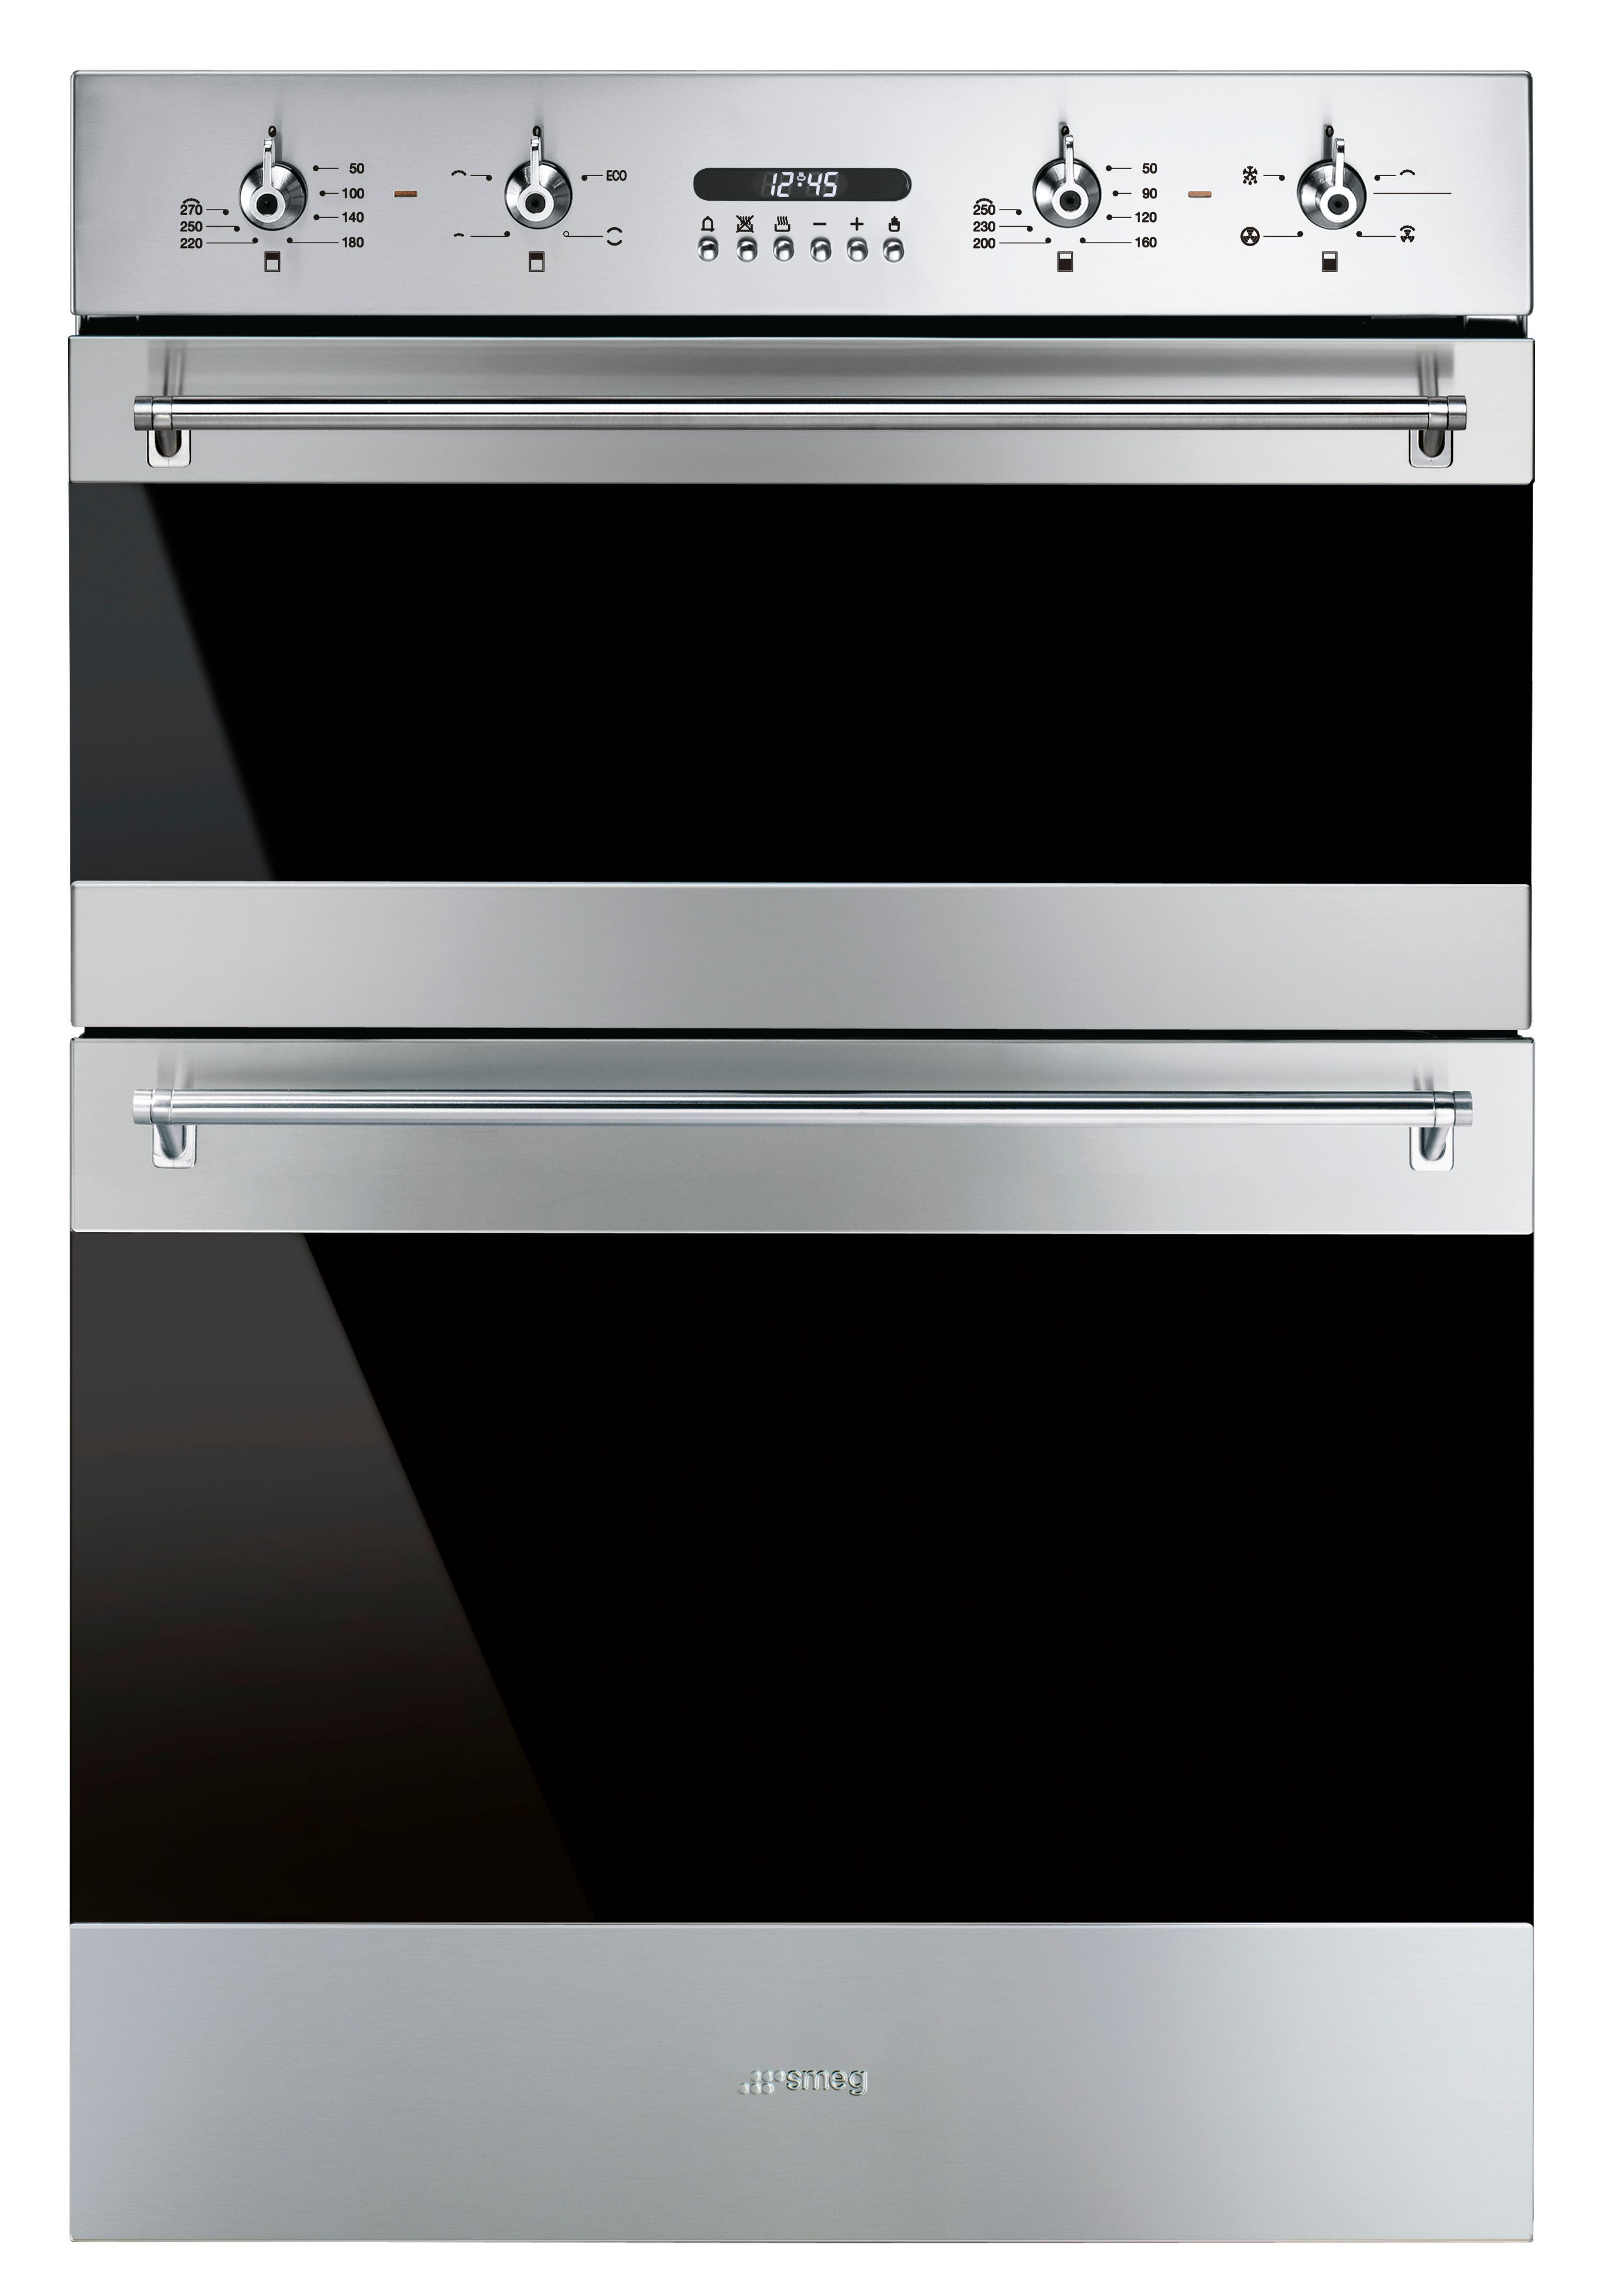 smeg double oven wiring diagram oven stainless rh pinterest com design [ 2717 x 3889 Pixel ]